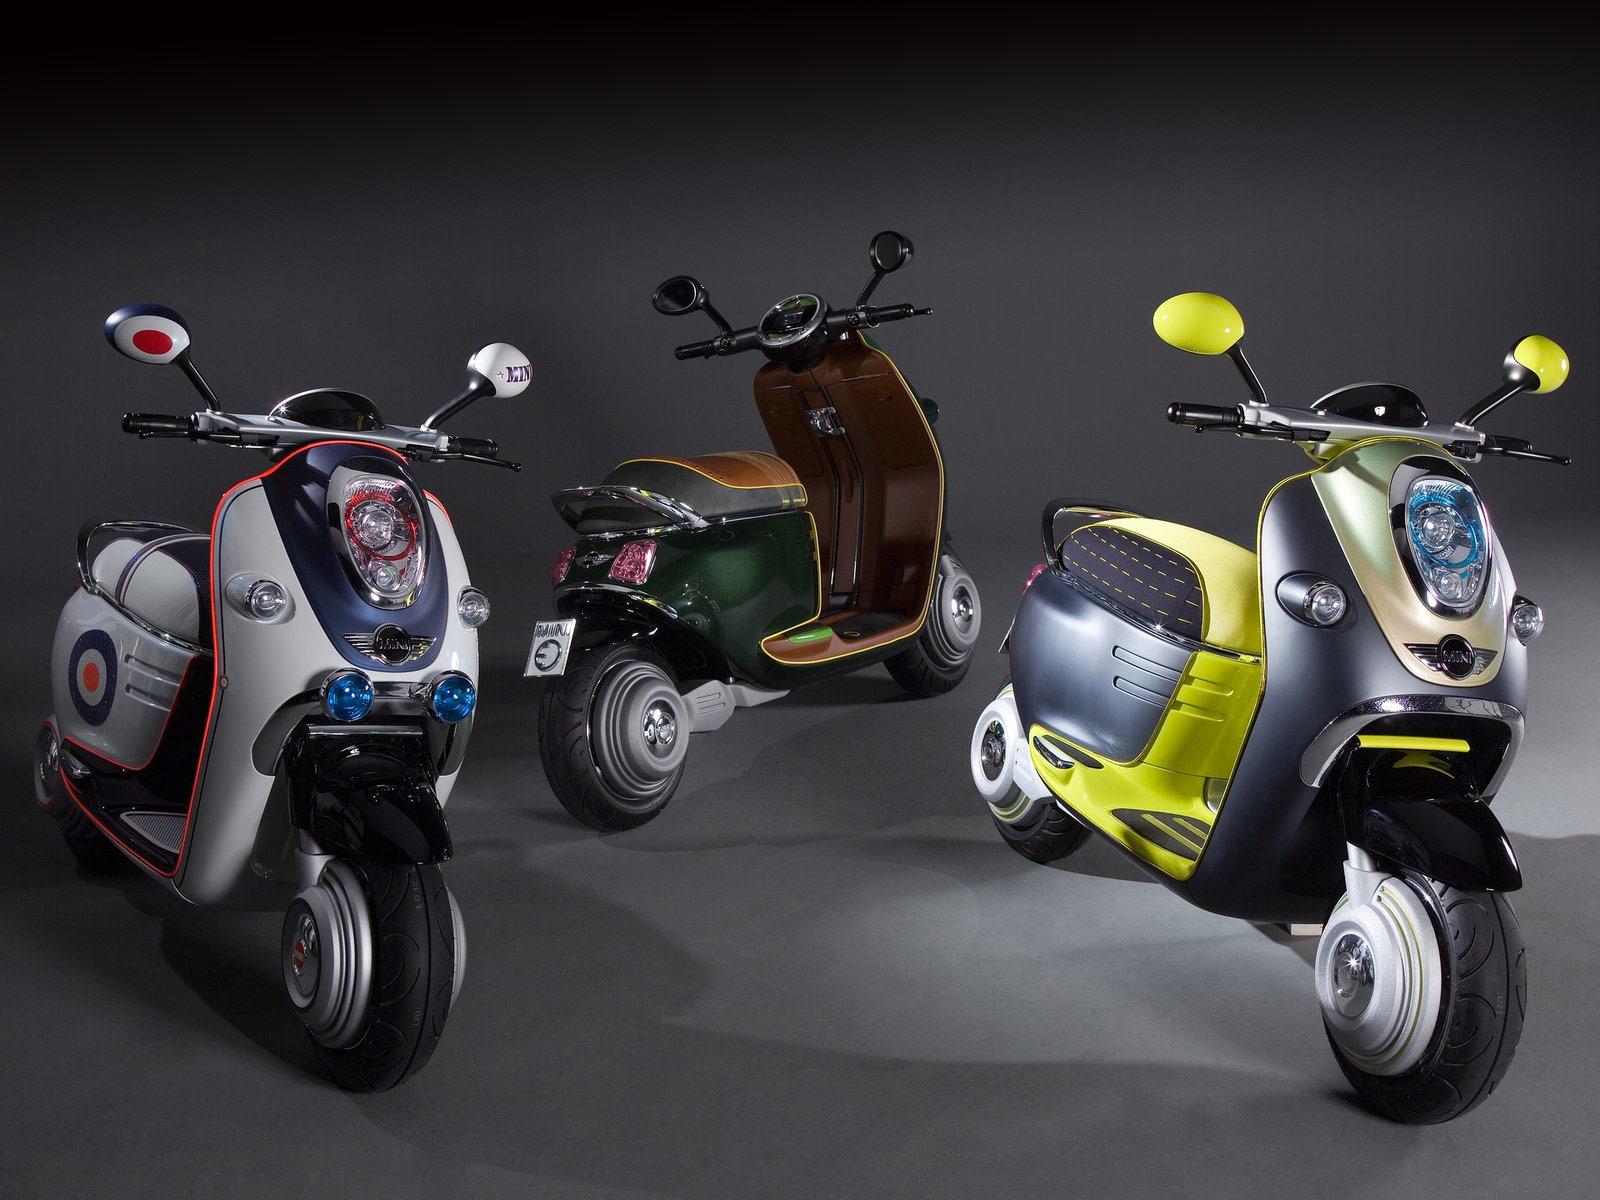 http://1.bp.blogspot.com/_ctd4qzl4Yp0/TJ083nZTbZI/AAAAAAAAEGY/ZLEYqN8KUUE/s1600/Mini-Scooter_E_Concept_2010_6.jpg